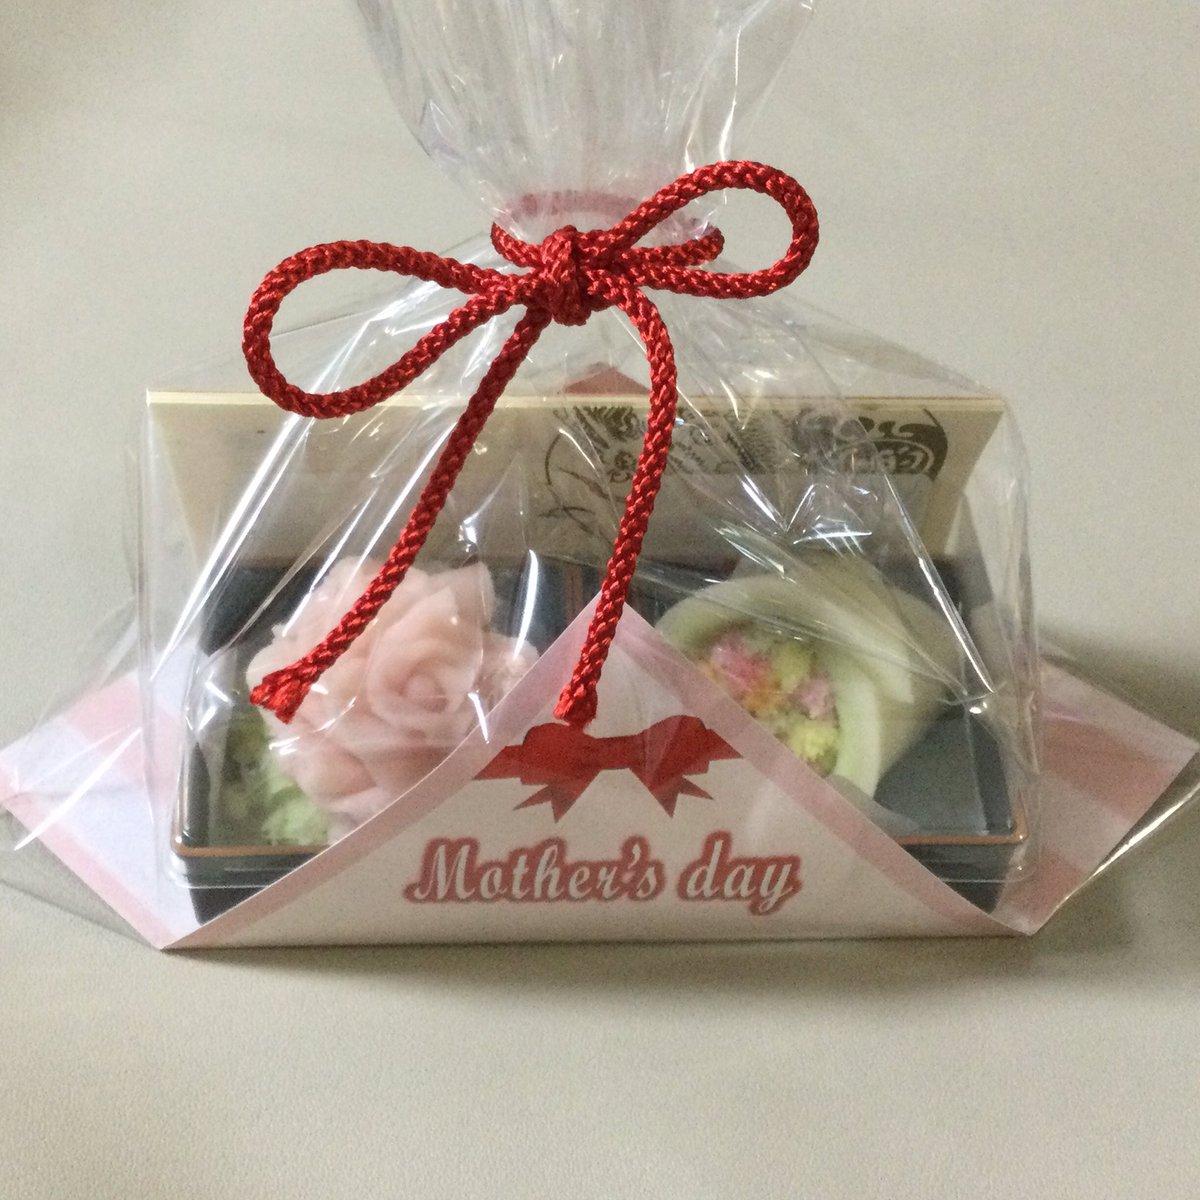 test ツイッターメディア - きんつば中田屋の上生菓子母の日セット☆ 「カーネーション」と「花束」の2種類 「花束」は、超絶技巧でとてもお美しく、そして美味しい☆ https://t.co/XVOCdBxxrp